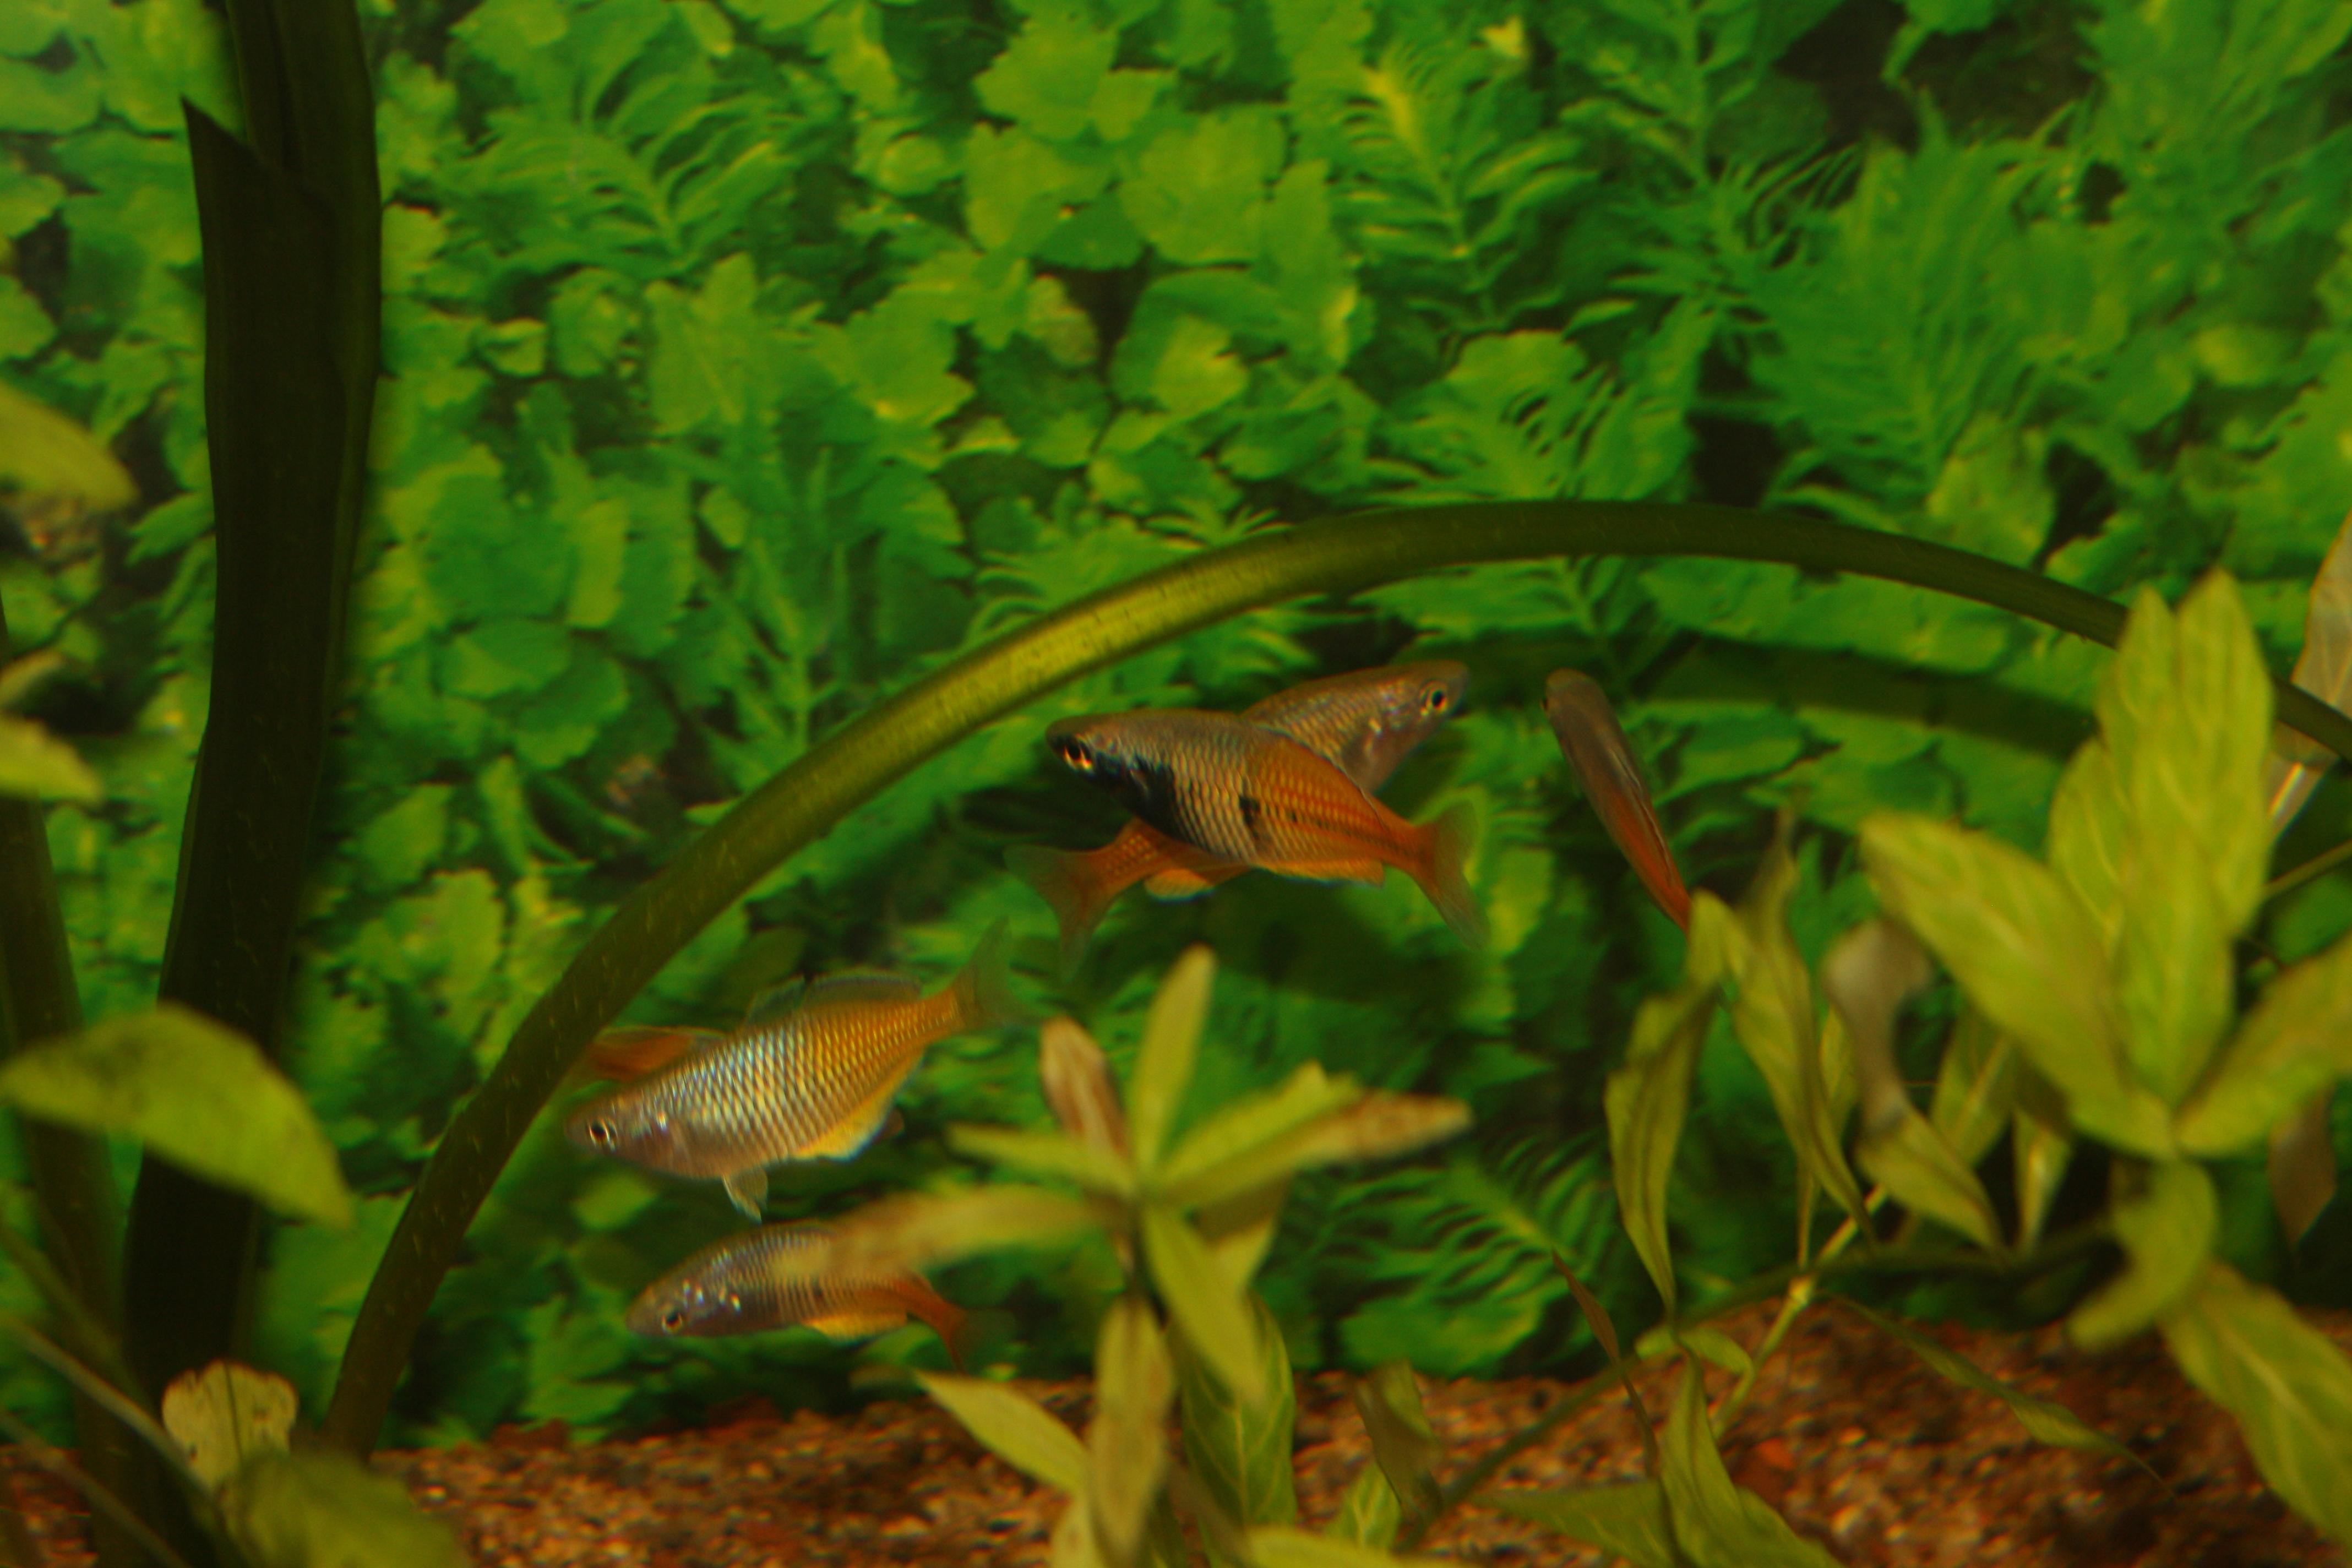 Les melanotaenia boesemani appelé poisson arc en ciel, ou rainbow fish en anglais